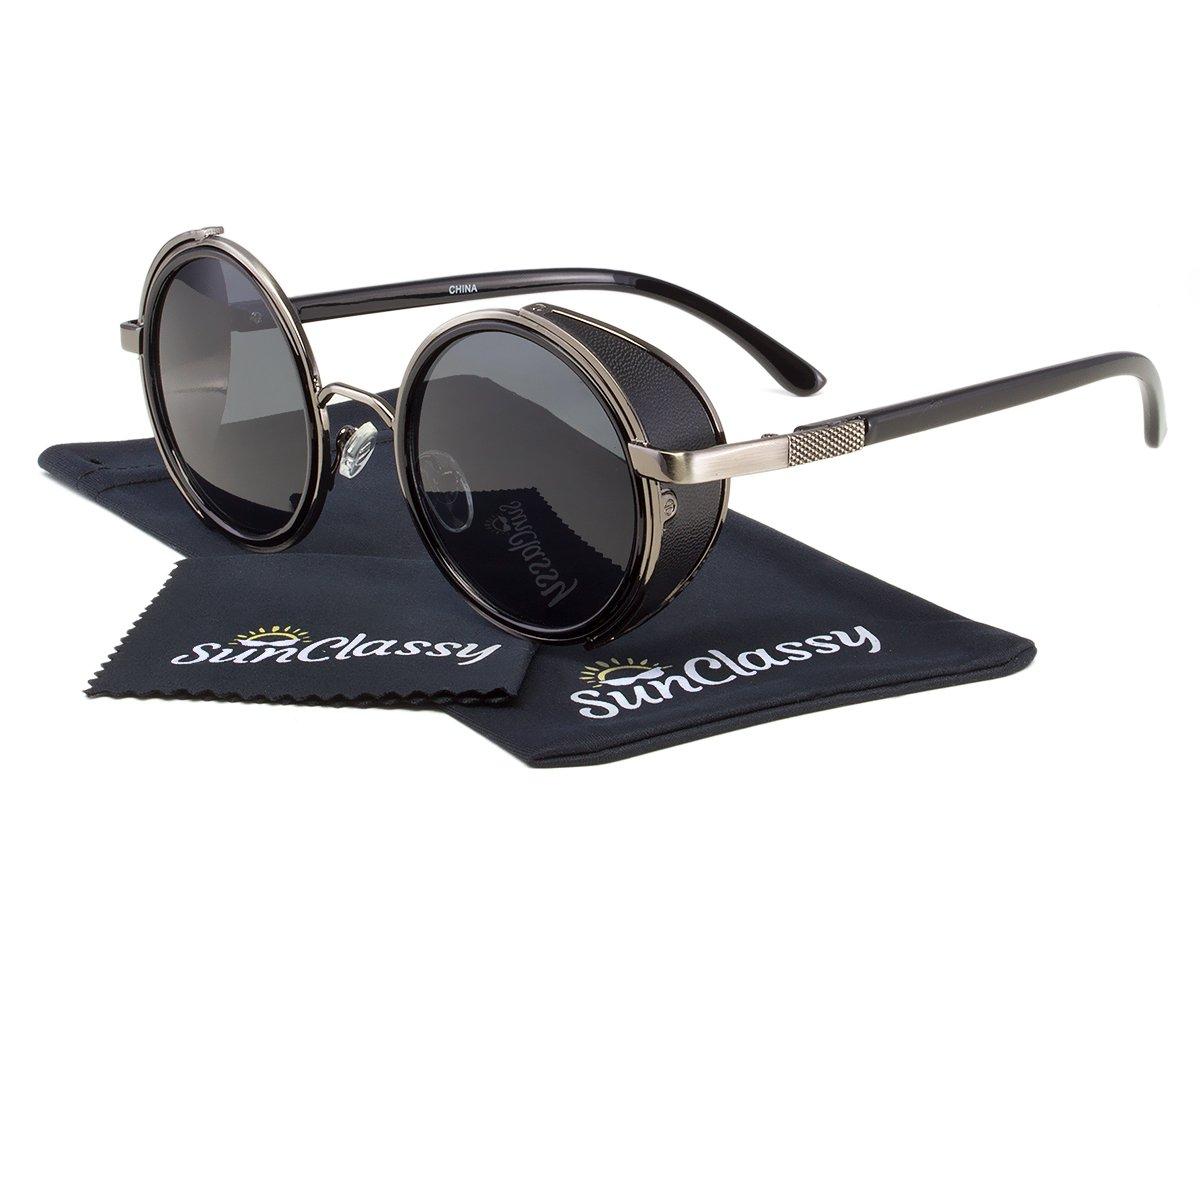 01842f5485 Sunclassy UV Protected Oval Unisex Sunglasses - (52mm